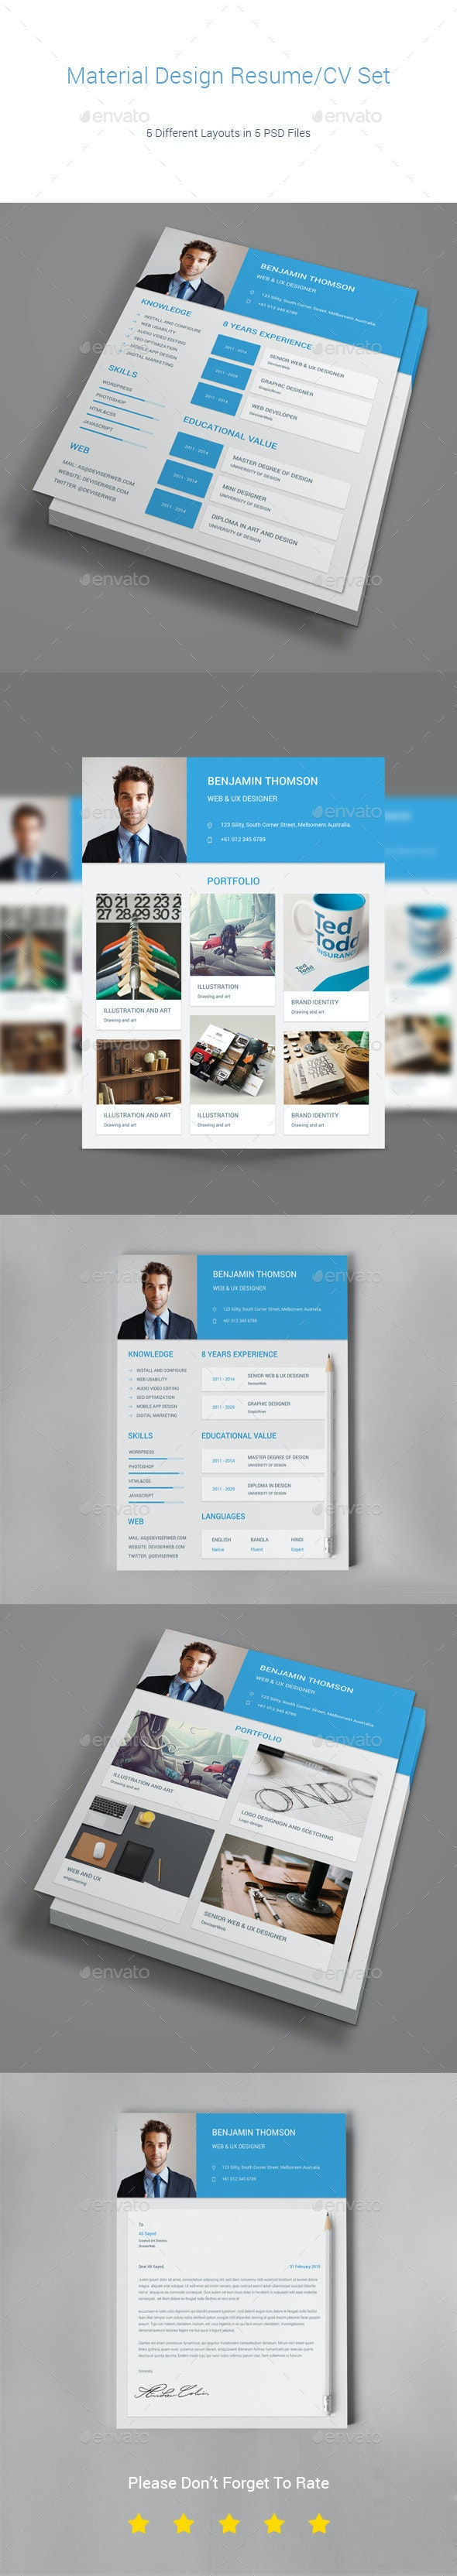 Material Design Resume/CV Set - Resumes Stationery